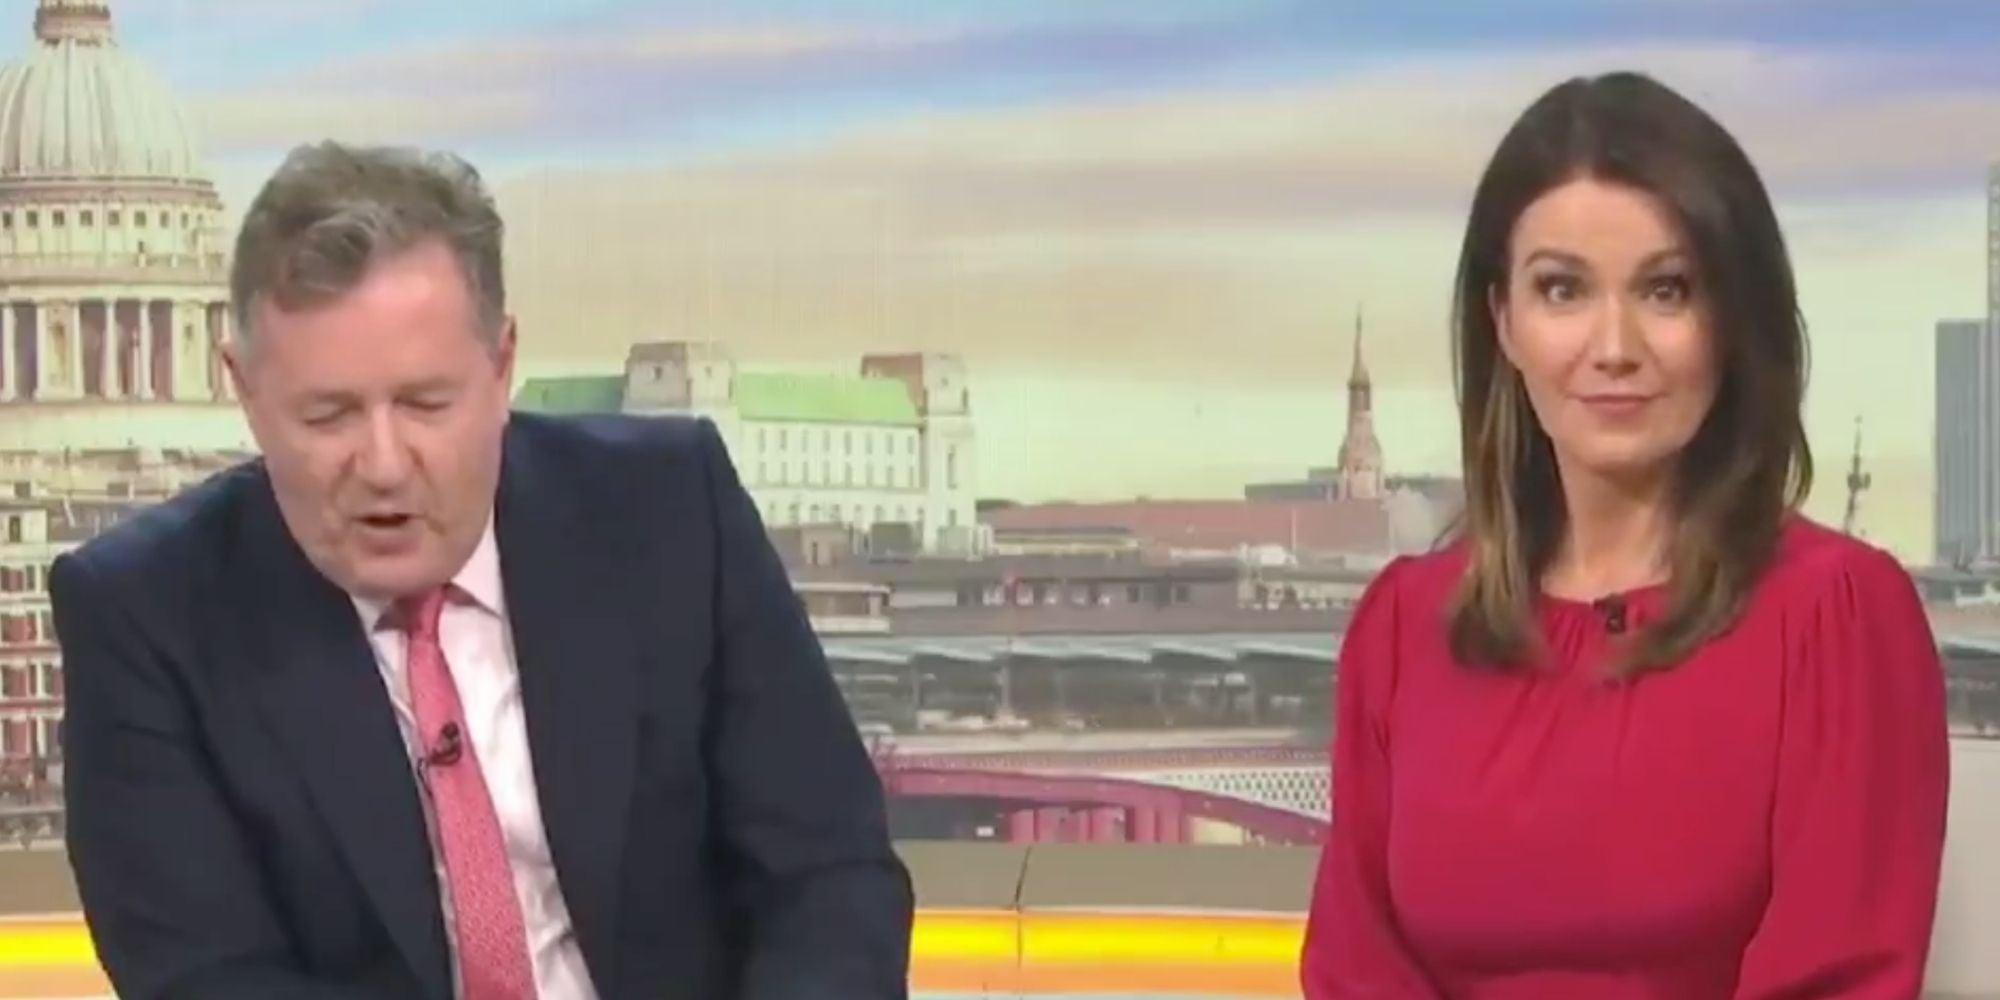 Piers Morgan just called Boris Johnson a 'nincompoop, sozzled, bonking, cad Prime Minister' thumbnail